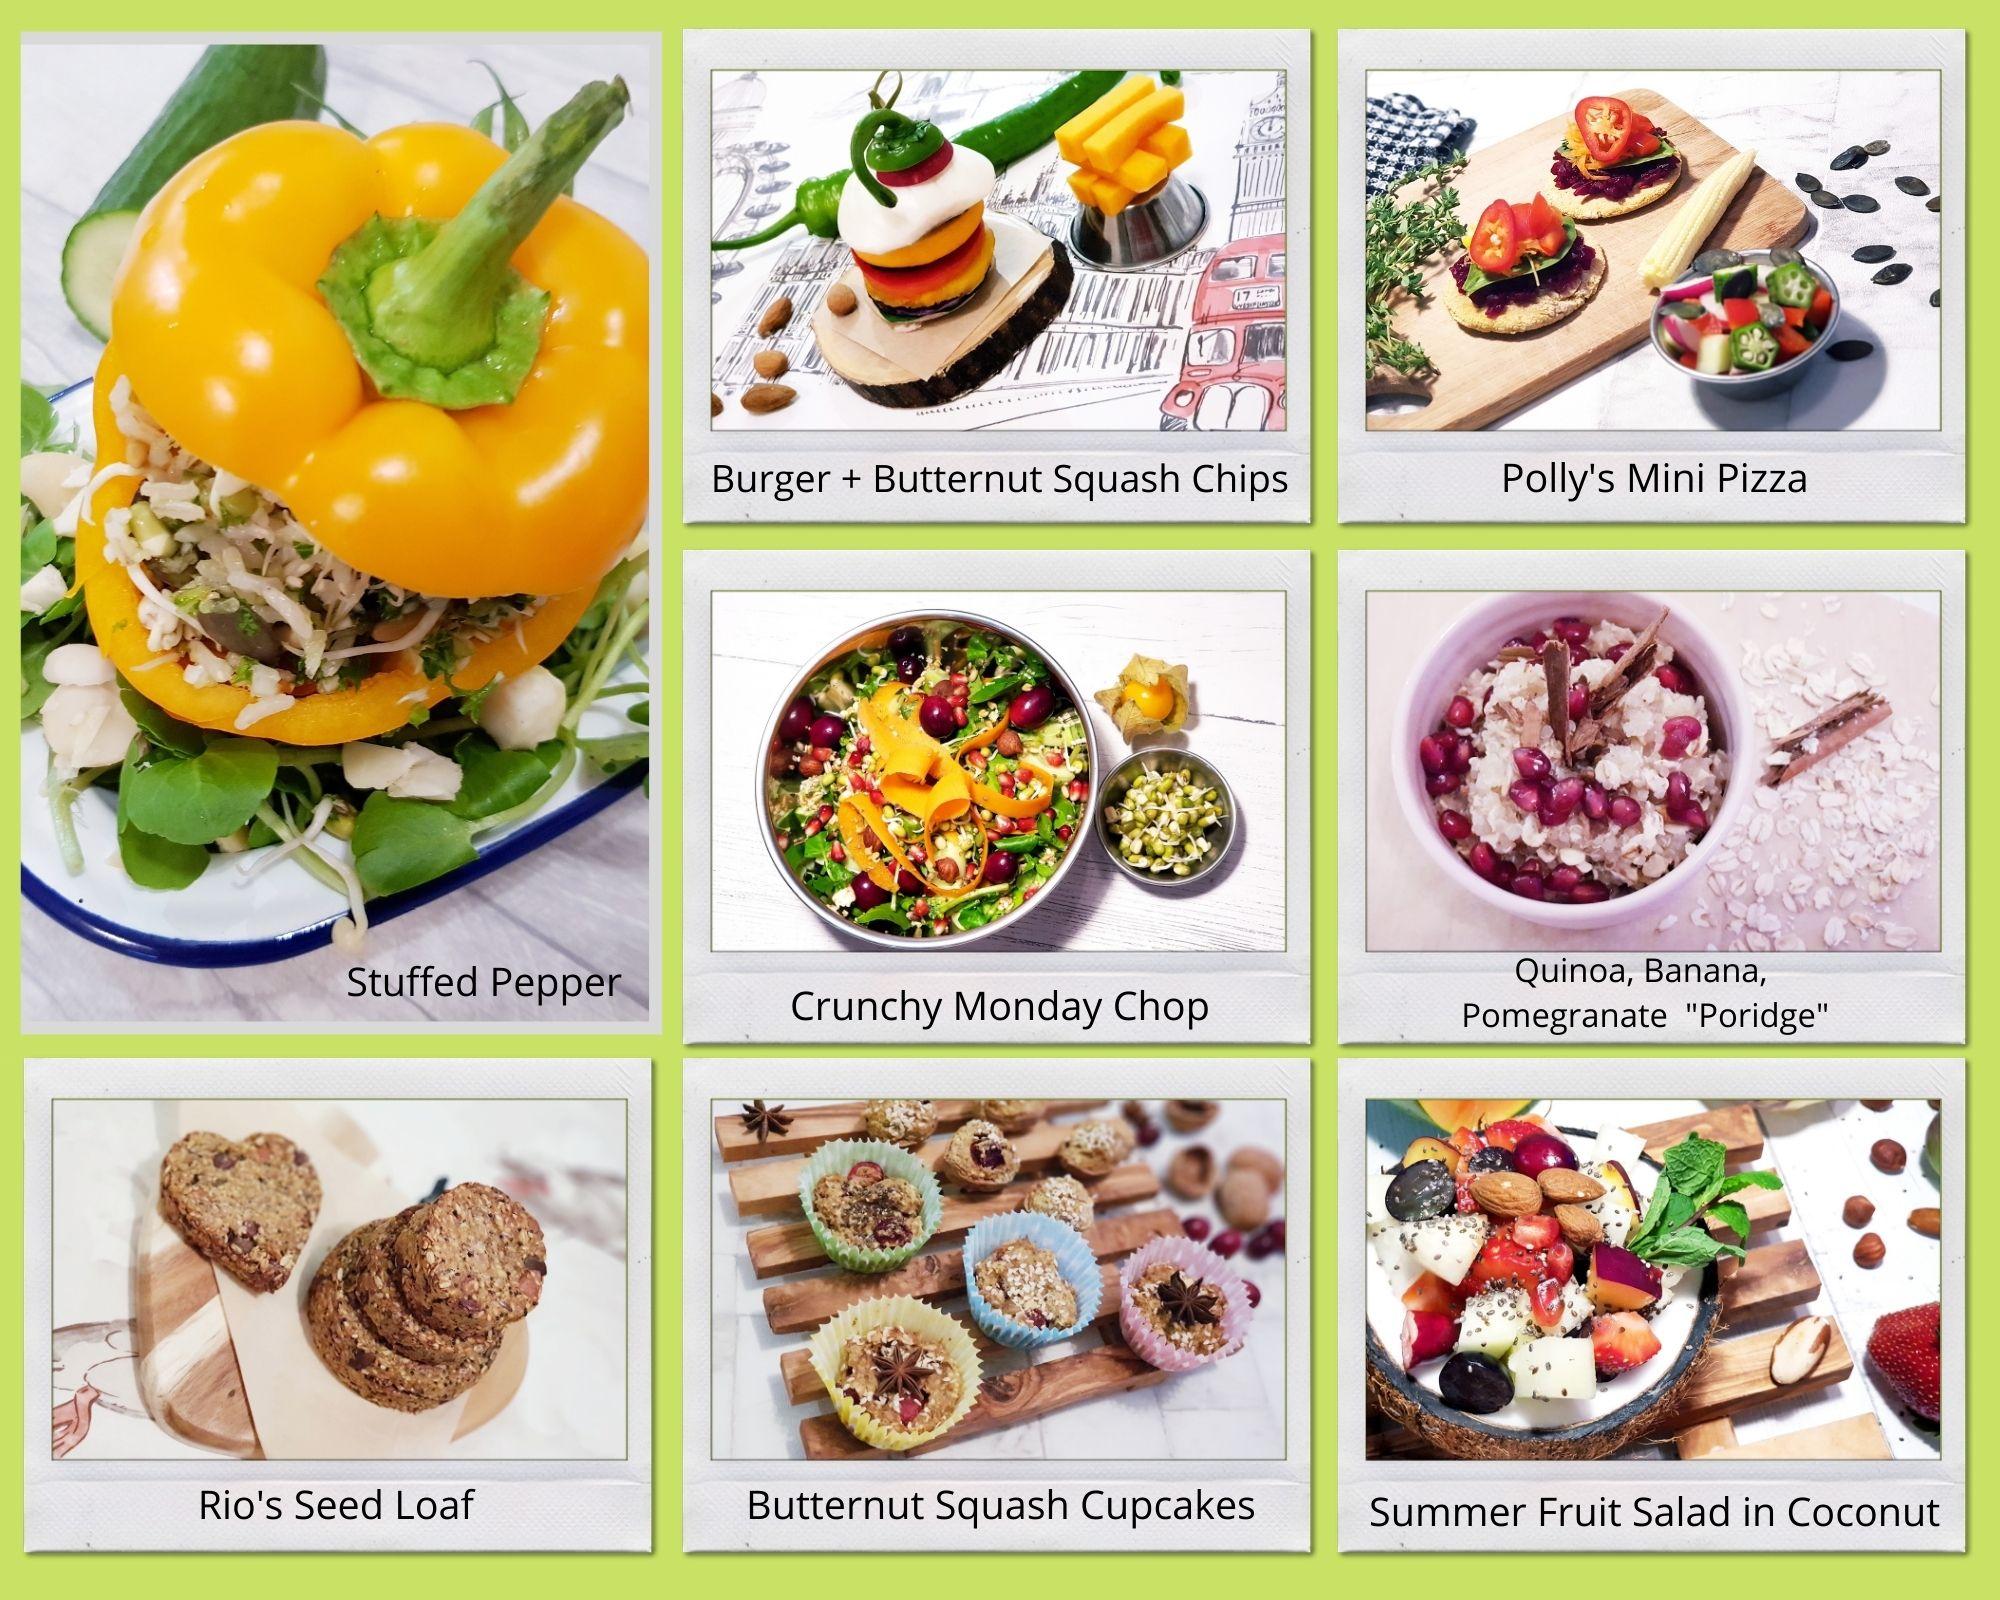 parrot-s-fine-cuisine-food-2.jpg